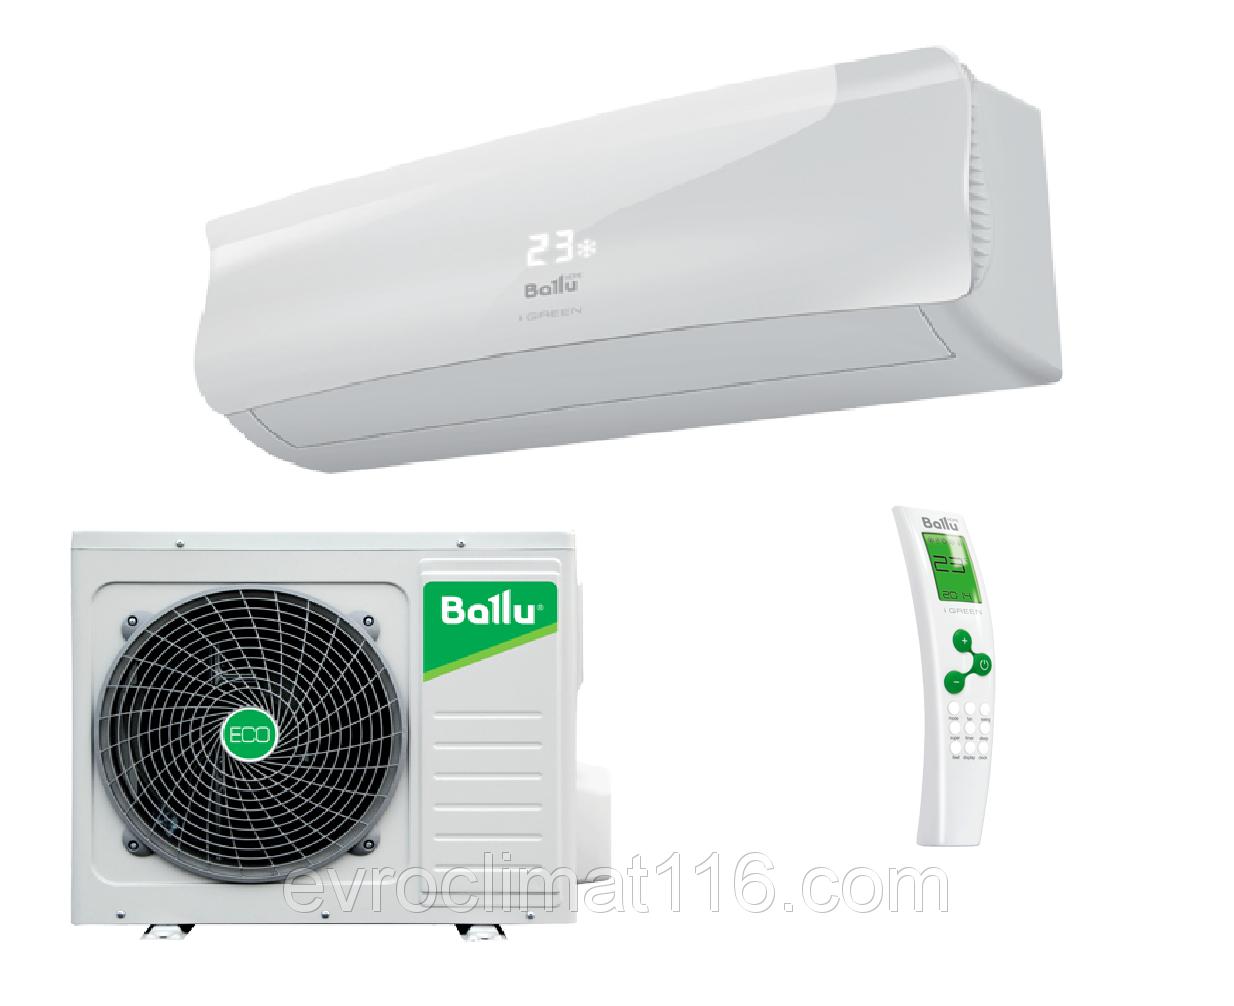 Сплит система Ballu BSA 24HN1 серии i GREEN